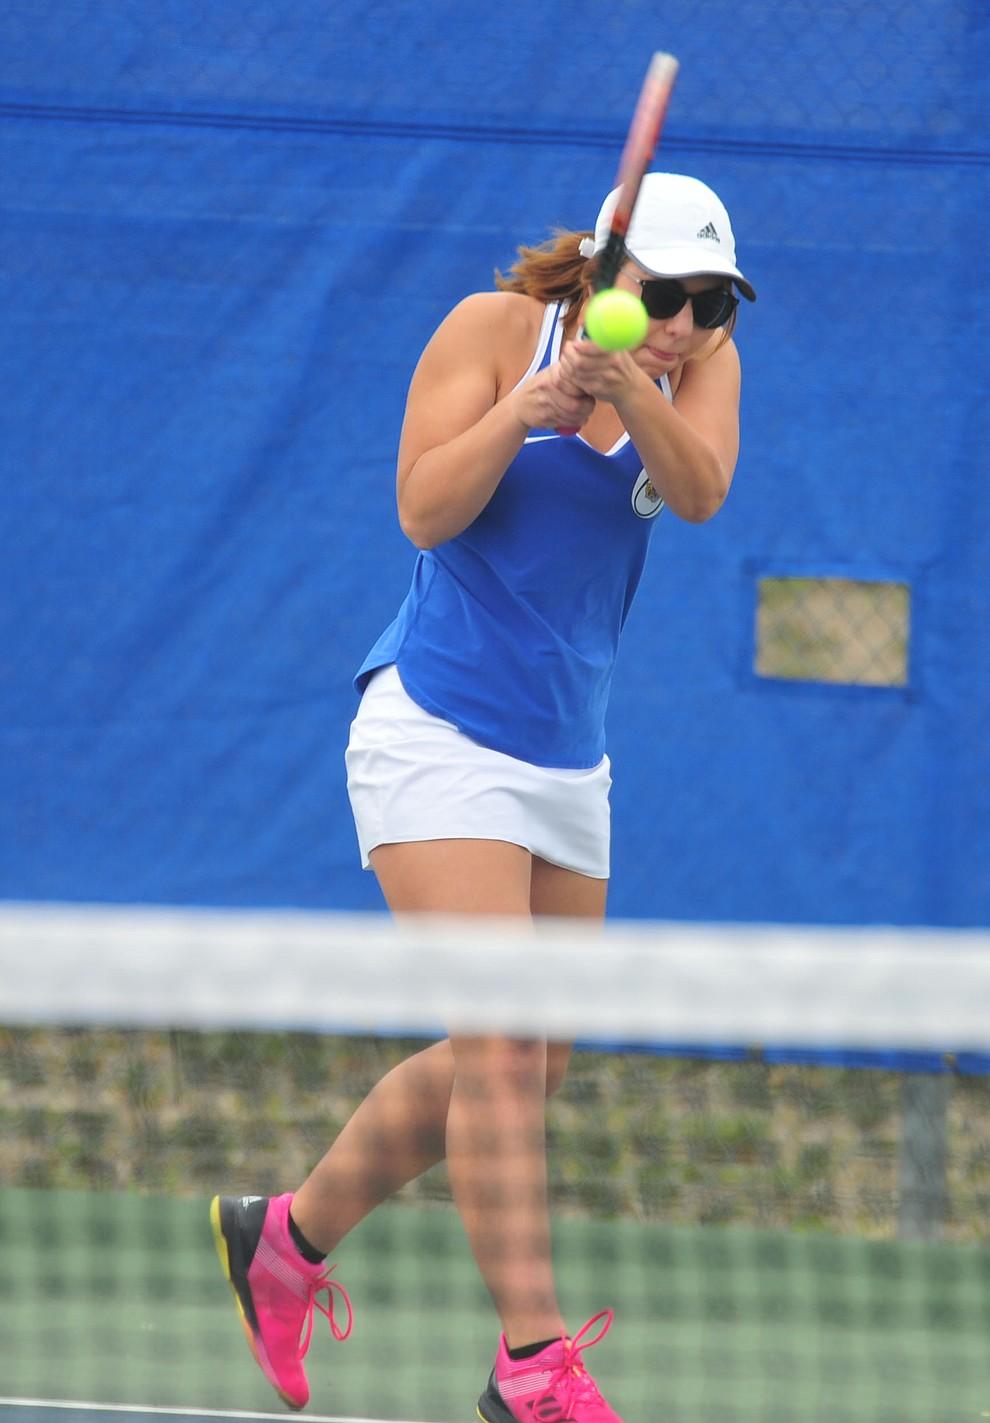 Prescott's Heidi Madsen hits a return shot as the Badgers play Ironwood Ridge in the first round of the Arizona Interscholastic Association State Team Tennis Tournament Tuesday, April 23 in Prescott.  (Les Stukenberg/Courier)